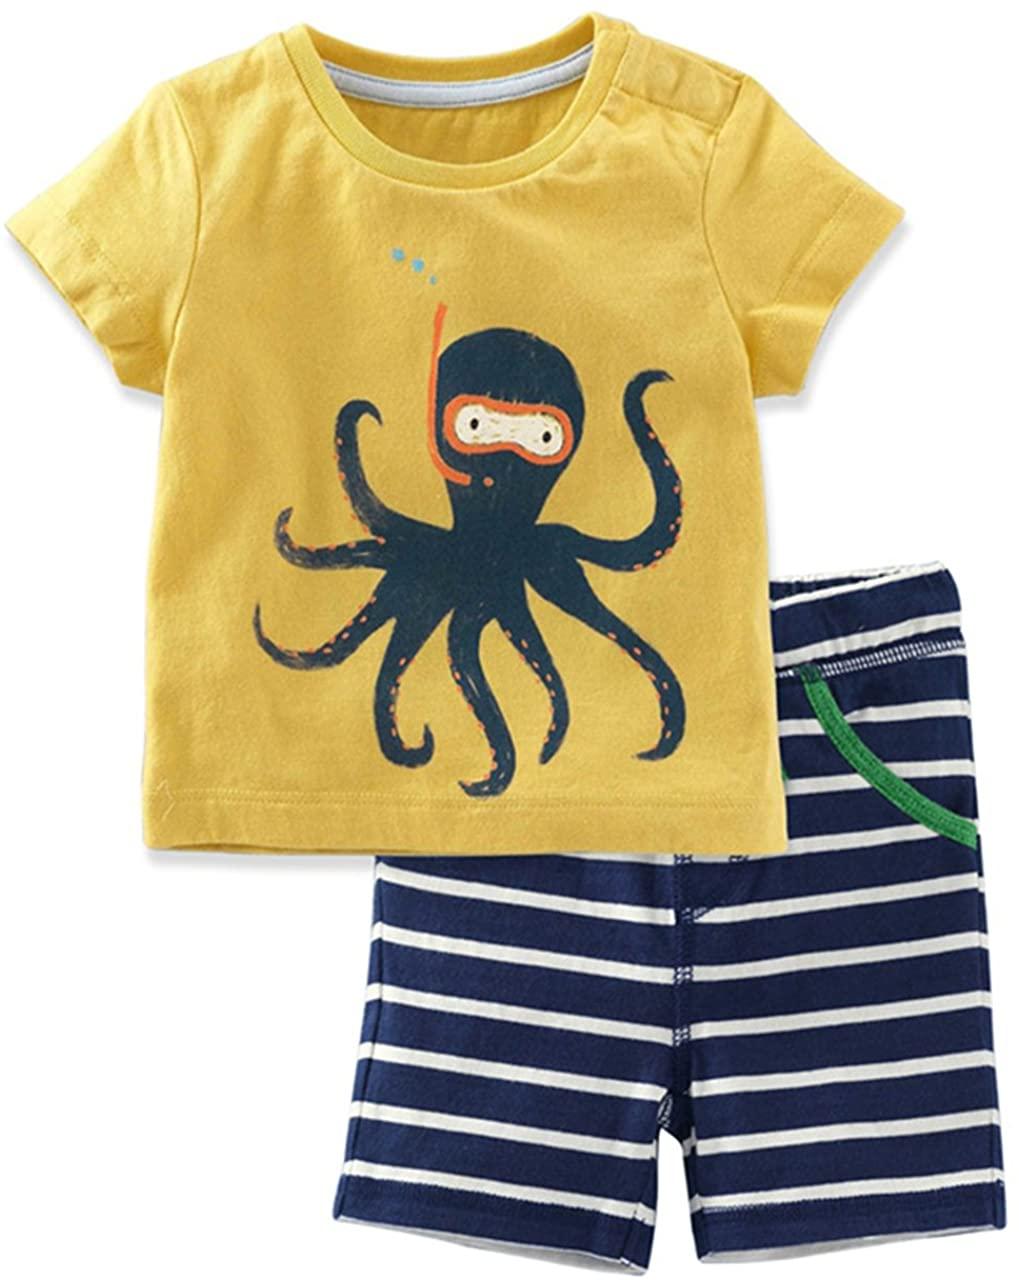 Little Boys Short Set Pajamas for Boys 100% Cotton Toddle Pjs Fire Truck Dinosaur Sleepwear Summer Clothes 1-7 T